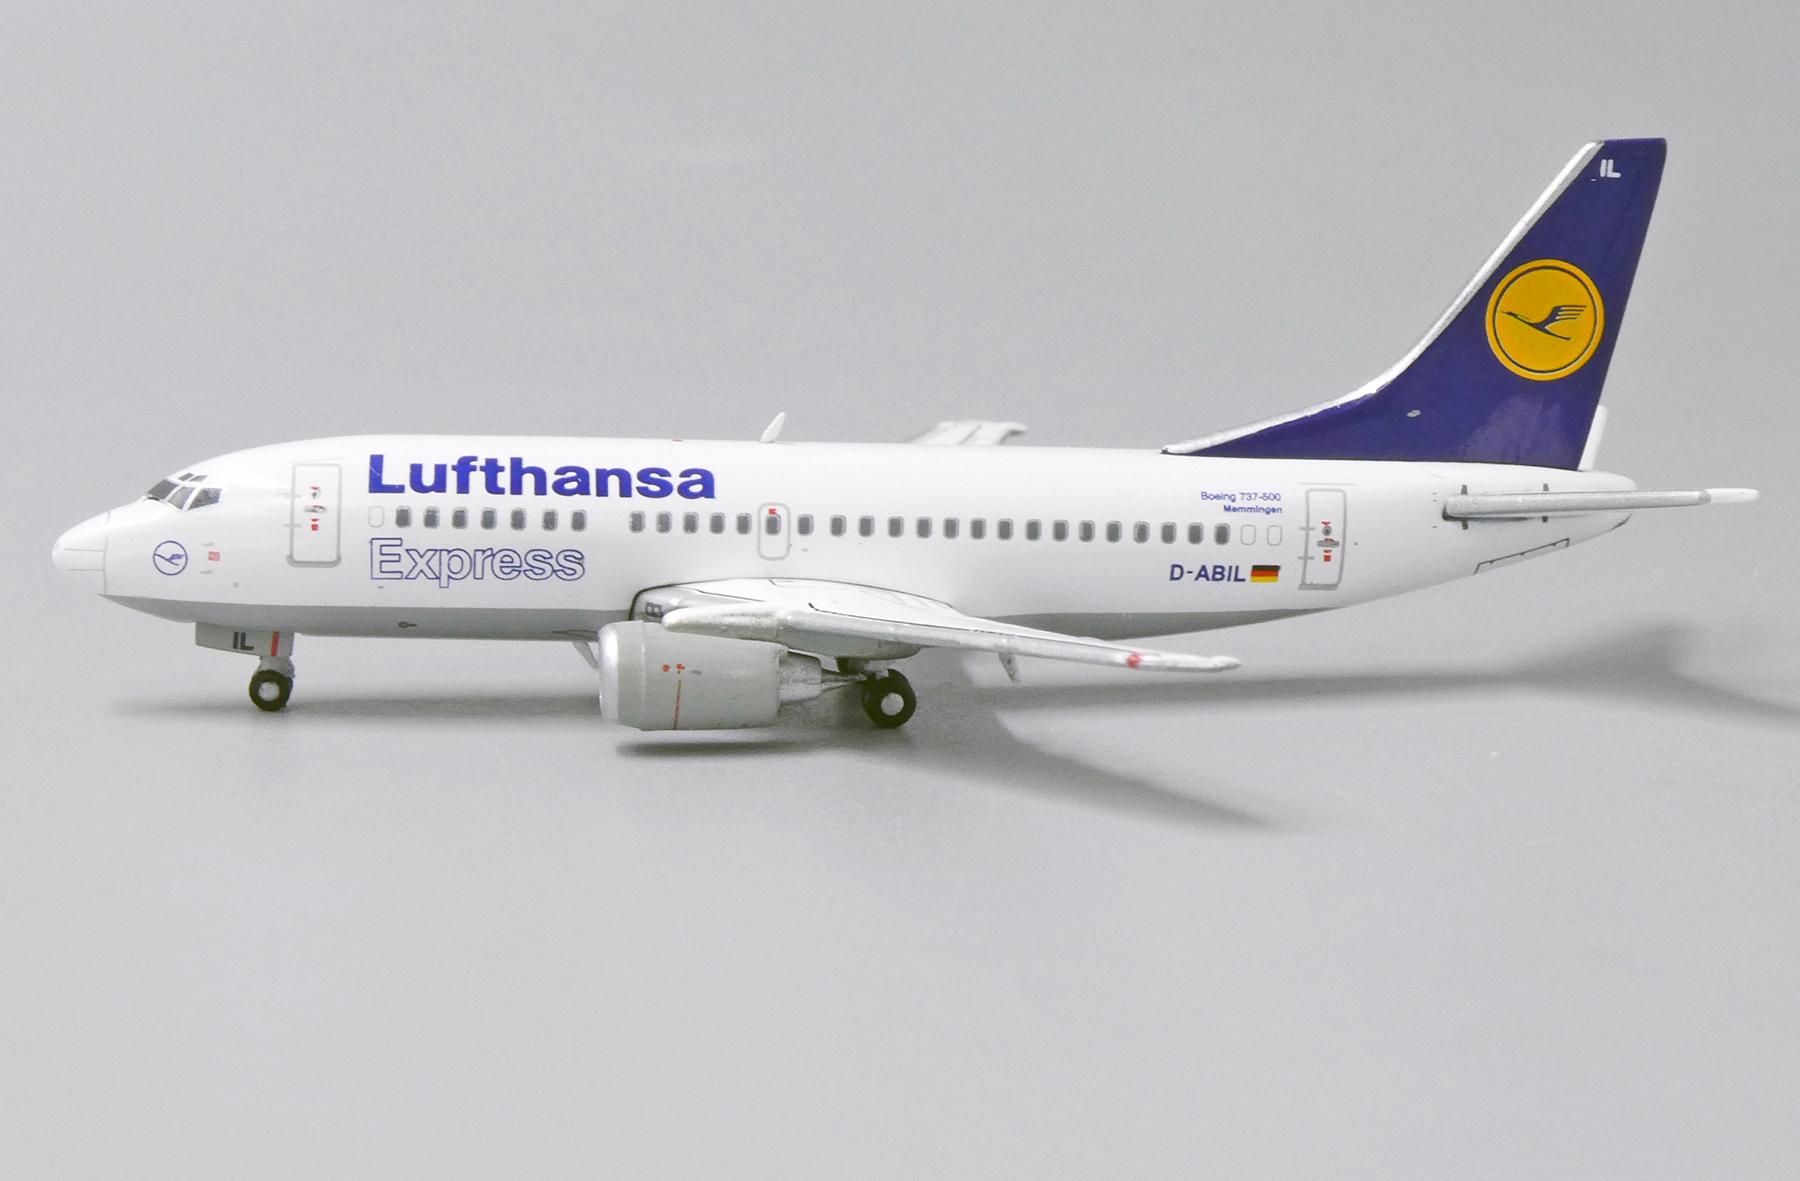 Scalemodelstore Com Jc Wings 1 400 Xx4886 Lufthansa Express Boeing 737 500